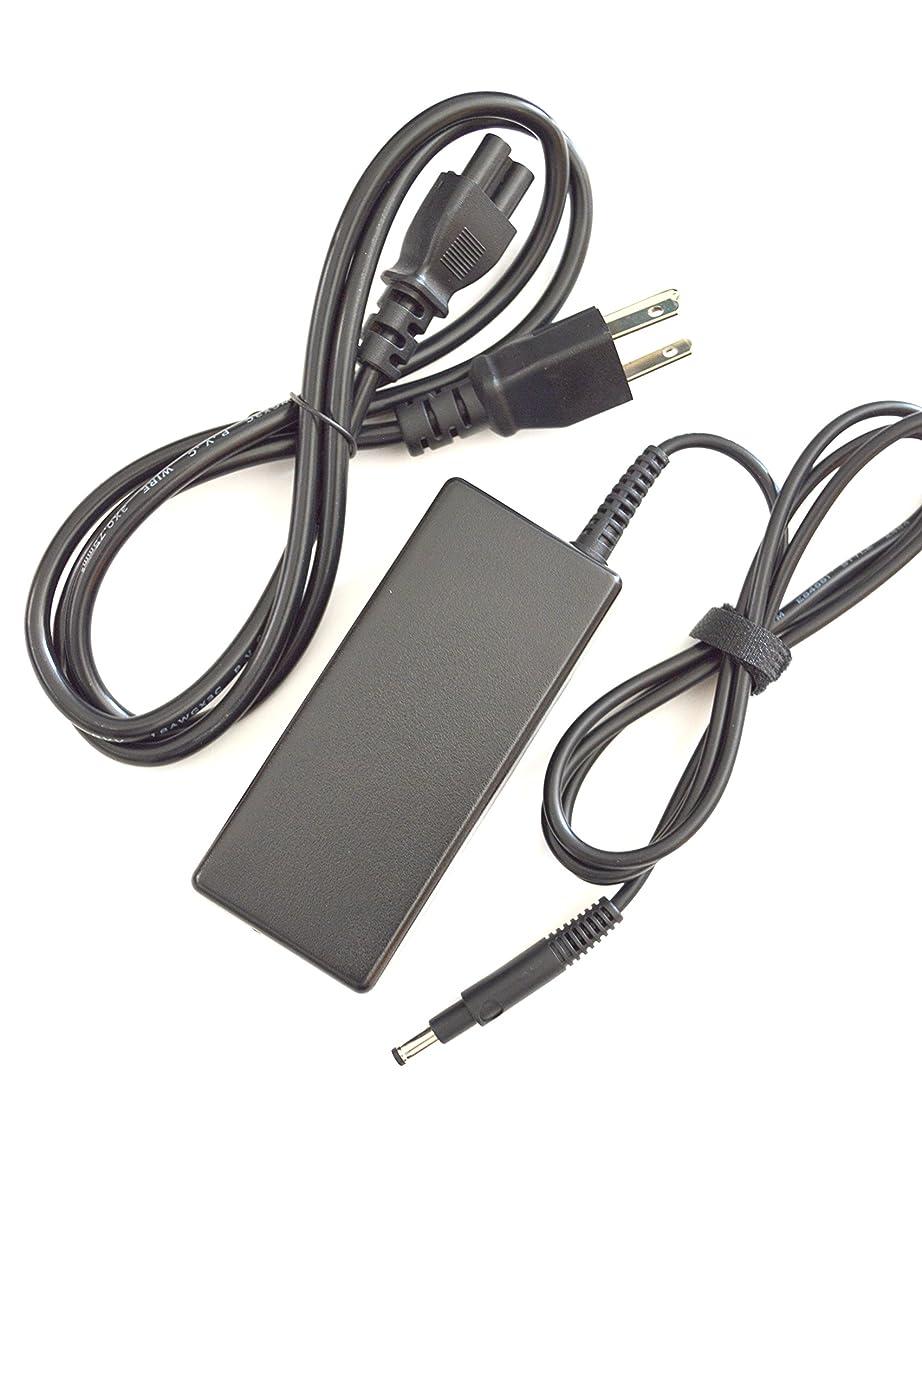 Ac Adapter Laptop Charger for HP Envy TouchSmart 4-1215, 4-1215DX, D1A99UA Ultrabook HP Envy TouchSmart 4-1195, 4-1195CA, C2K82UA Ultrabook HP Envy TouchSmart 4-1000, 4t-1000 CTO Ultrabook Sleekbook Ultrabook Laptop Notebook Battery Power Supply Cord Plug